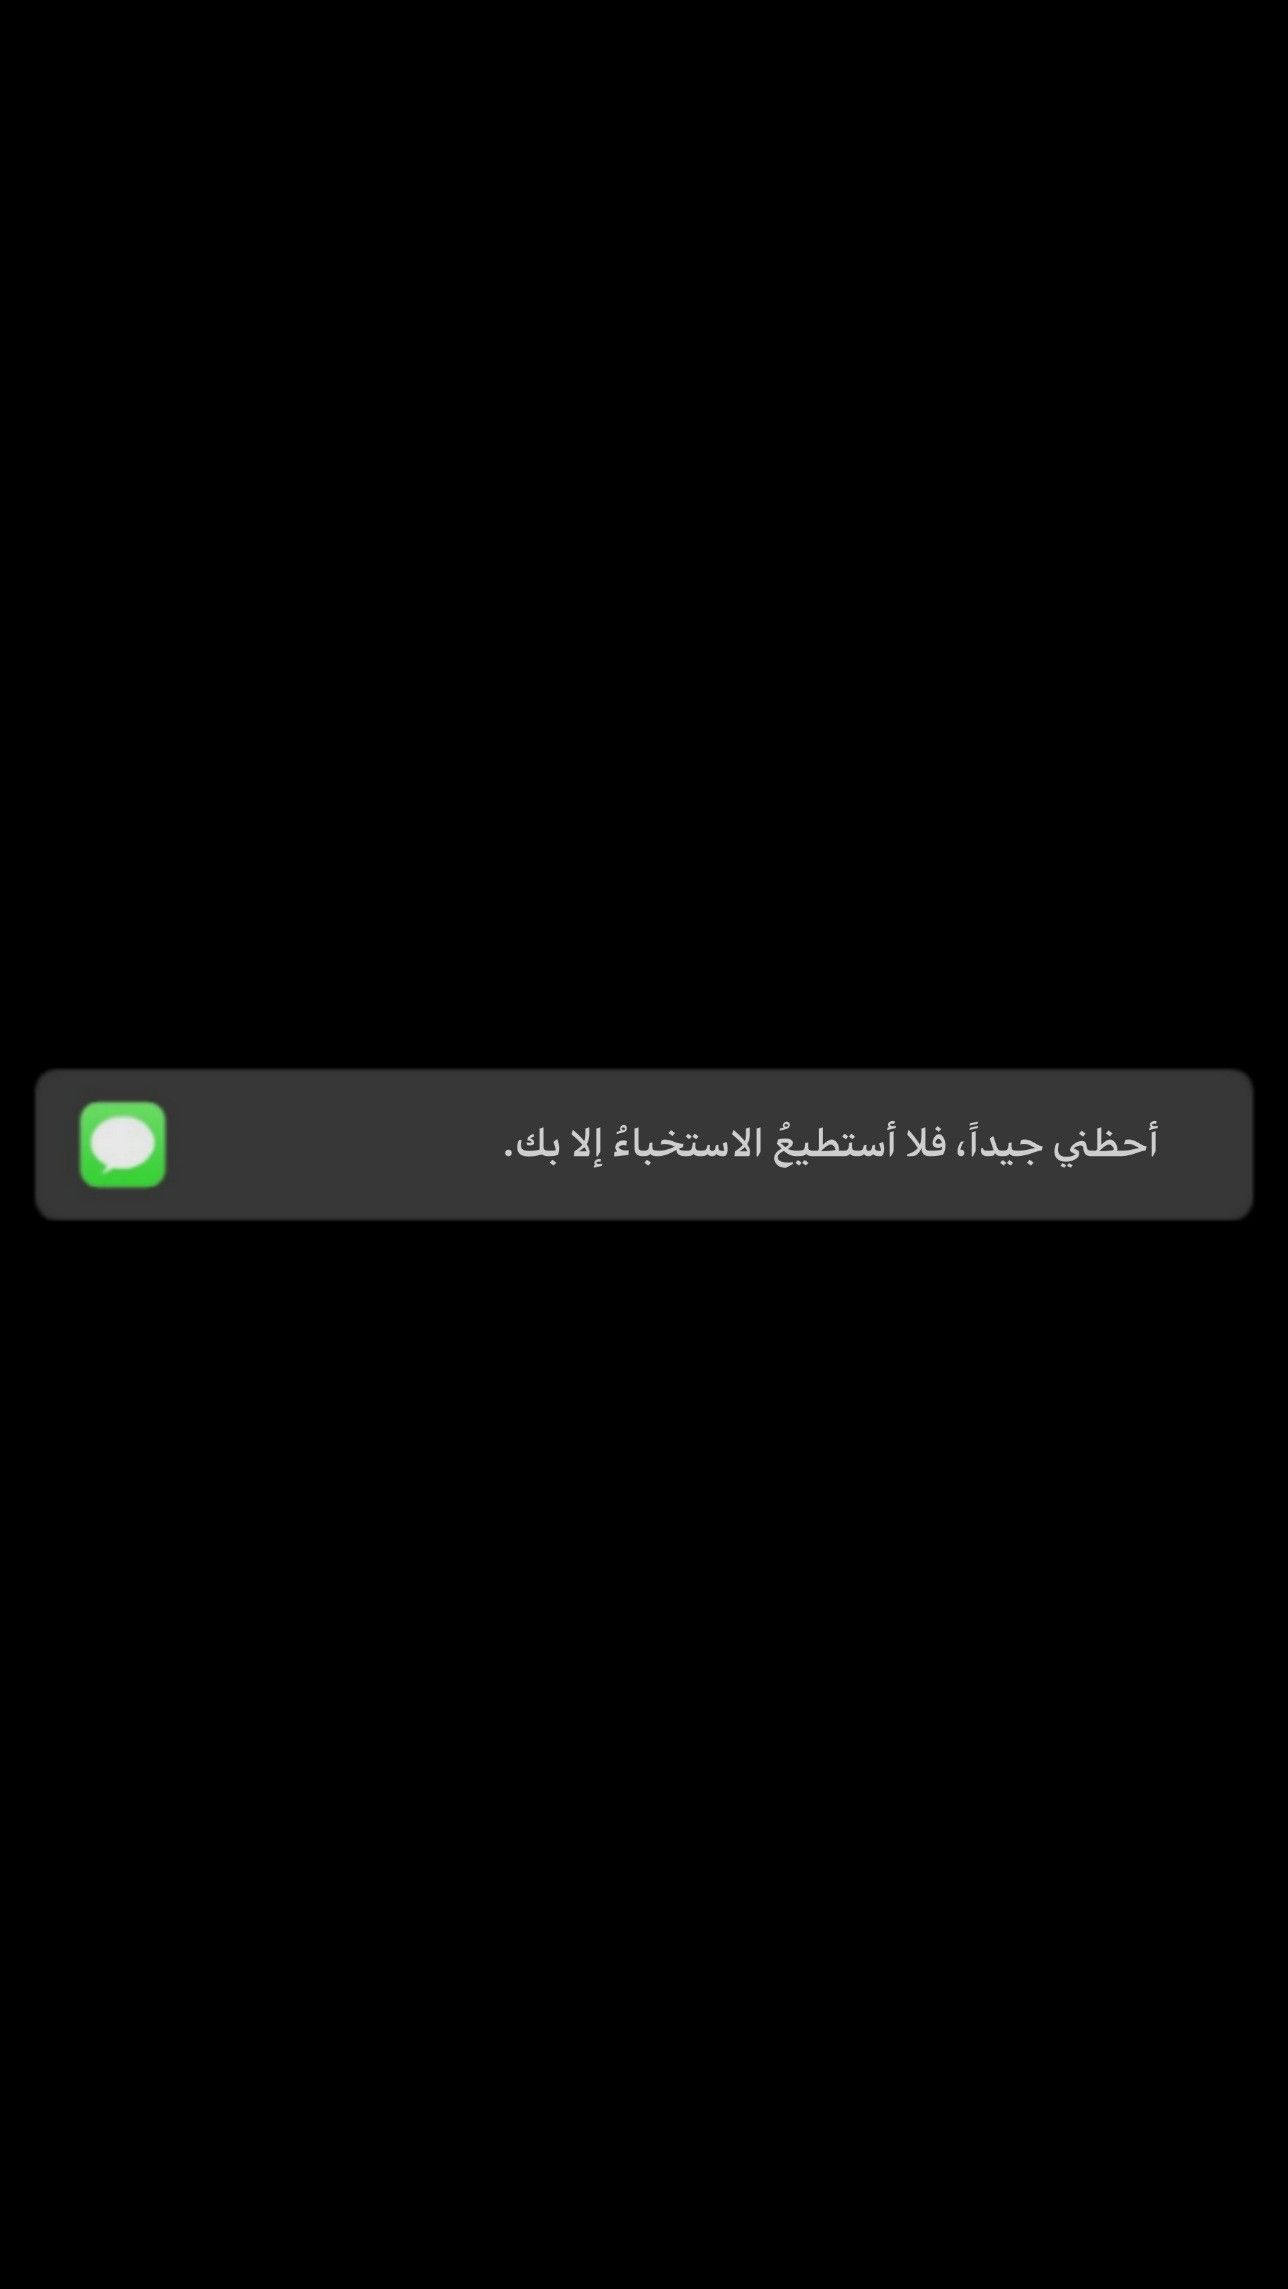 تصميمي كتاباتي حب تمبلر اقتباسات خواطر تليجرام In 2021 Quran Quotes Inspirational Beautiful Arabic Words Funny Phrases